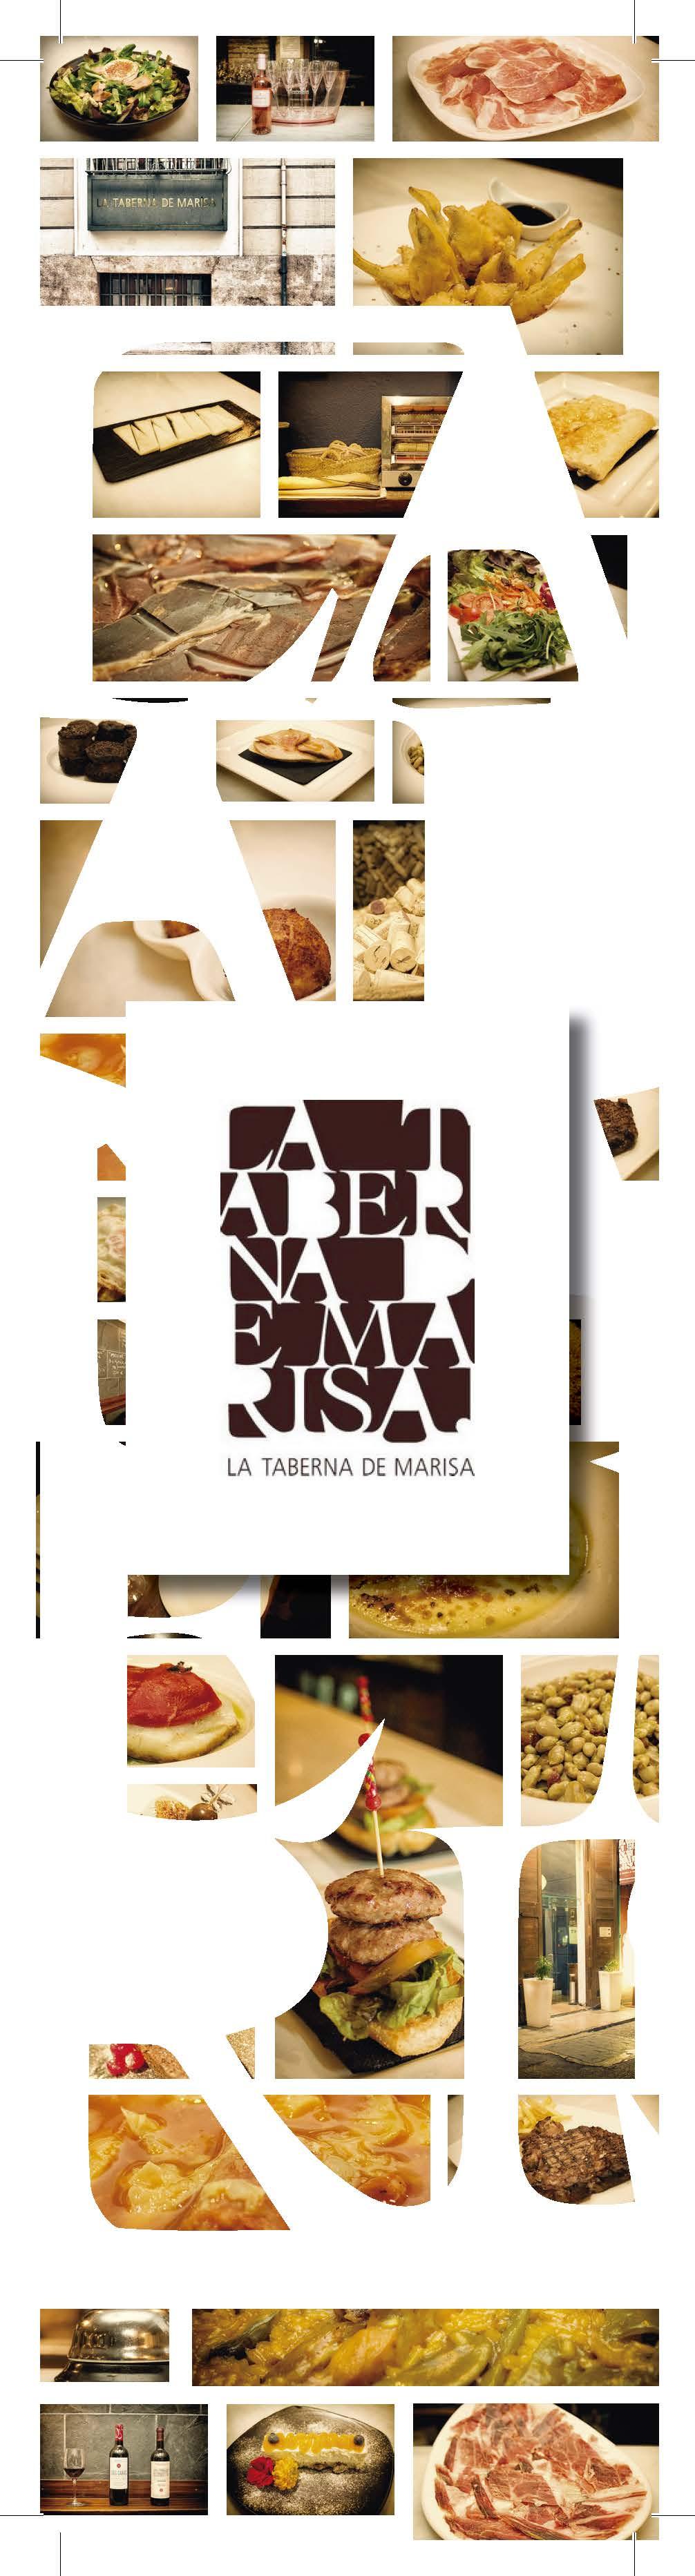 carta_marisa_ord_Página_30